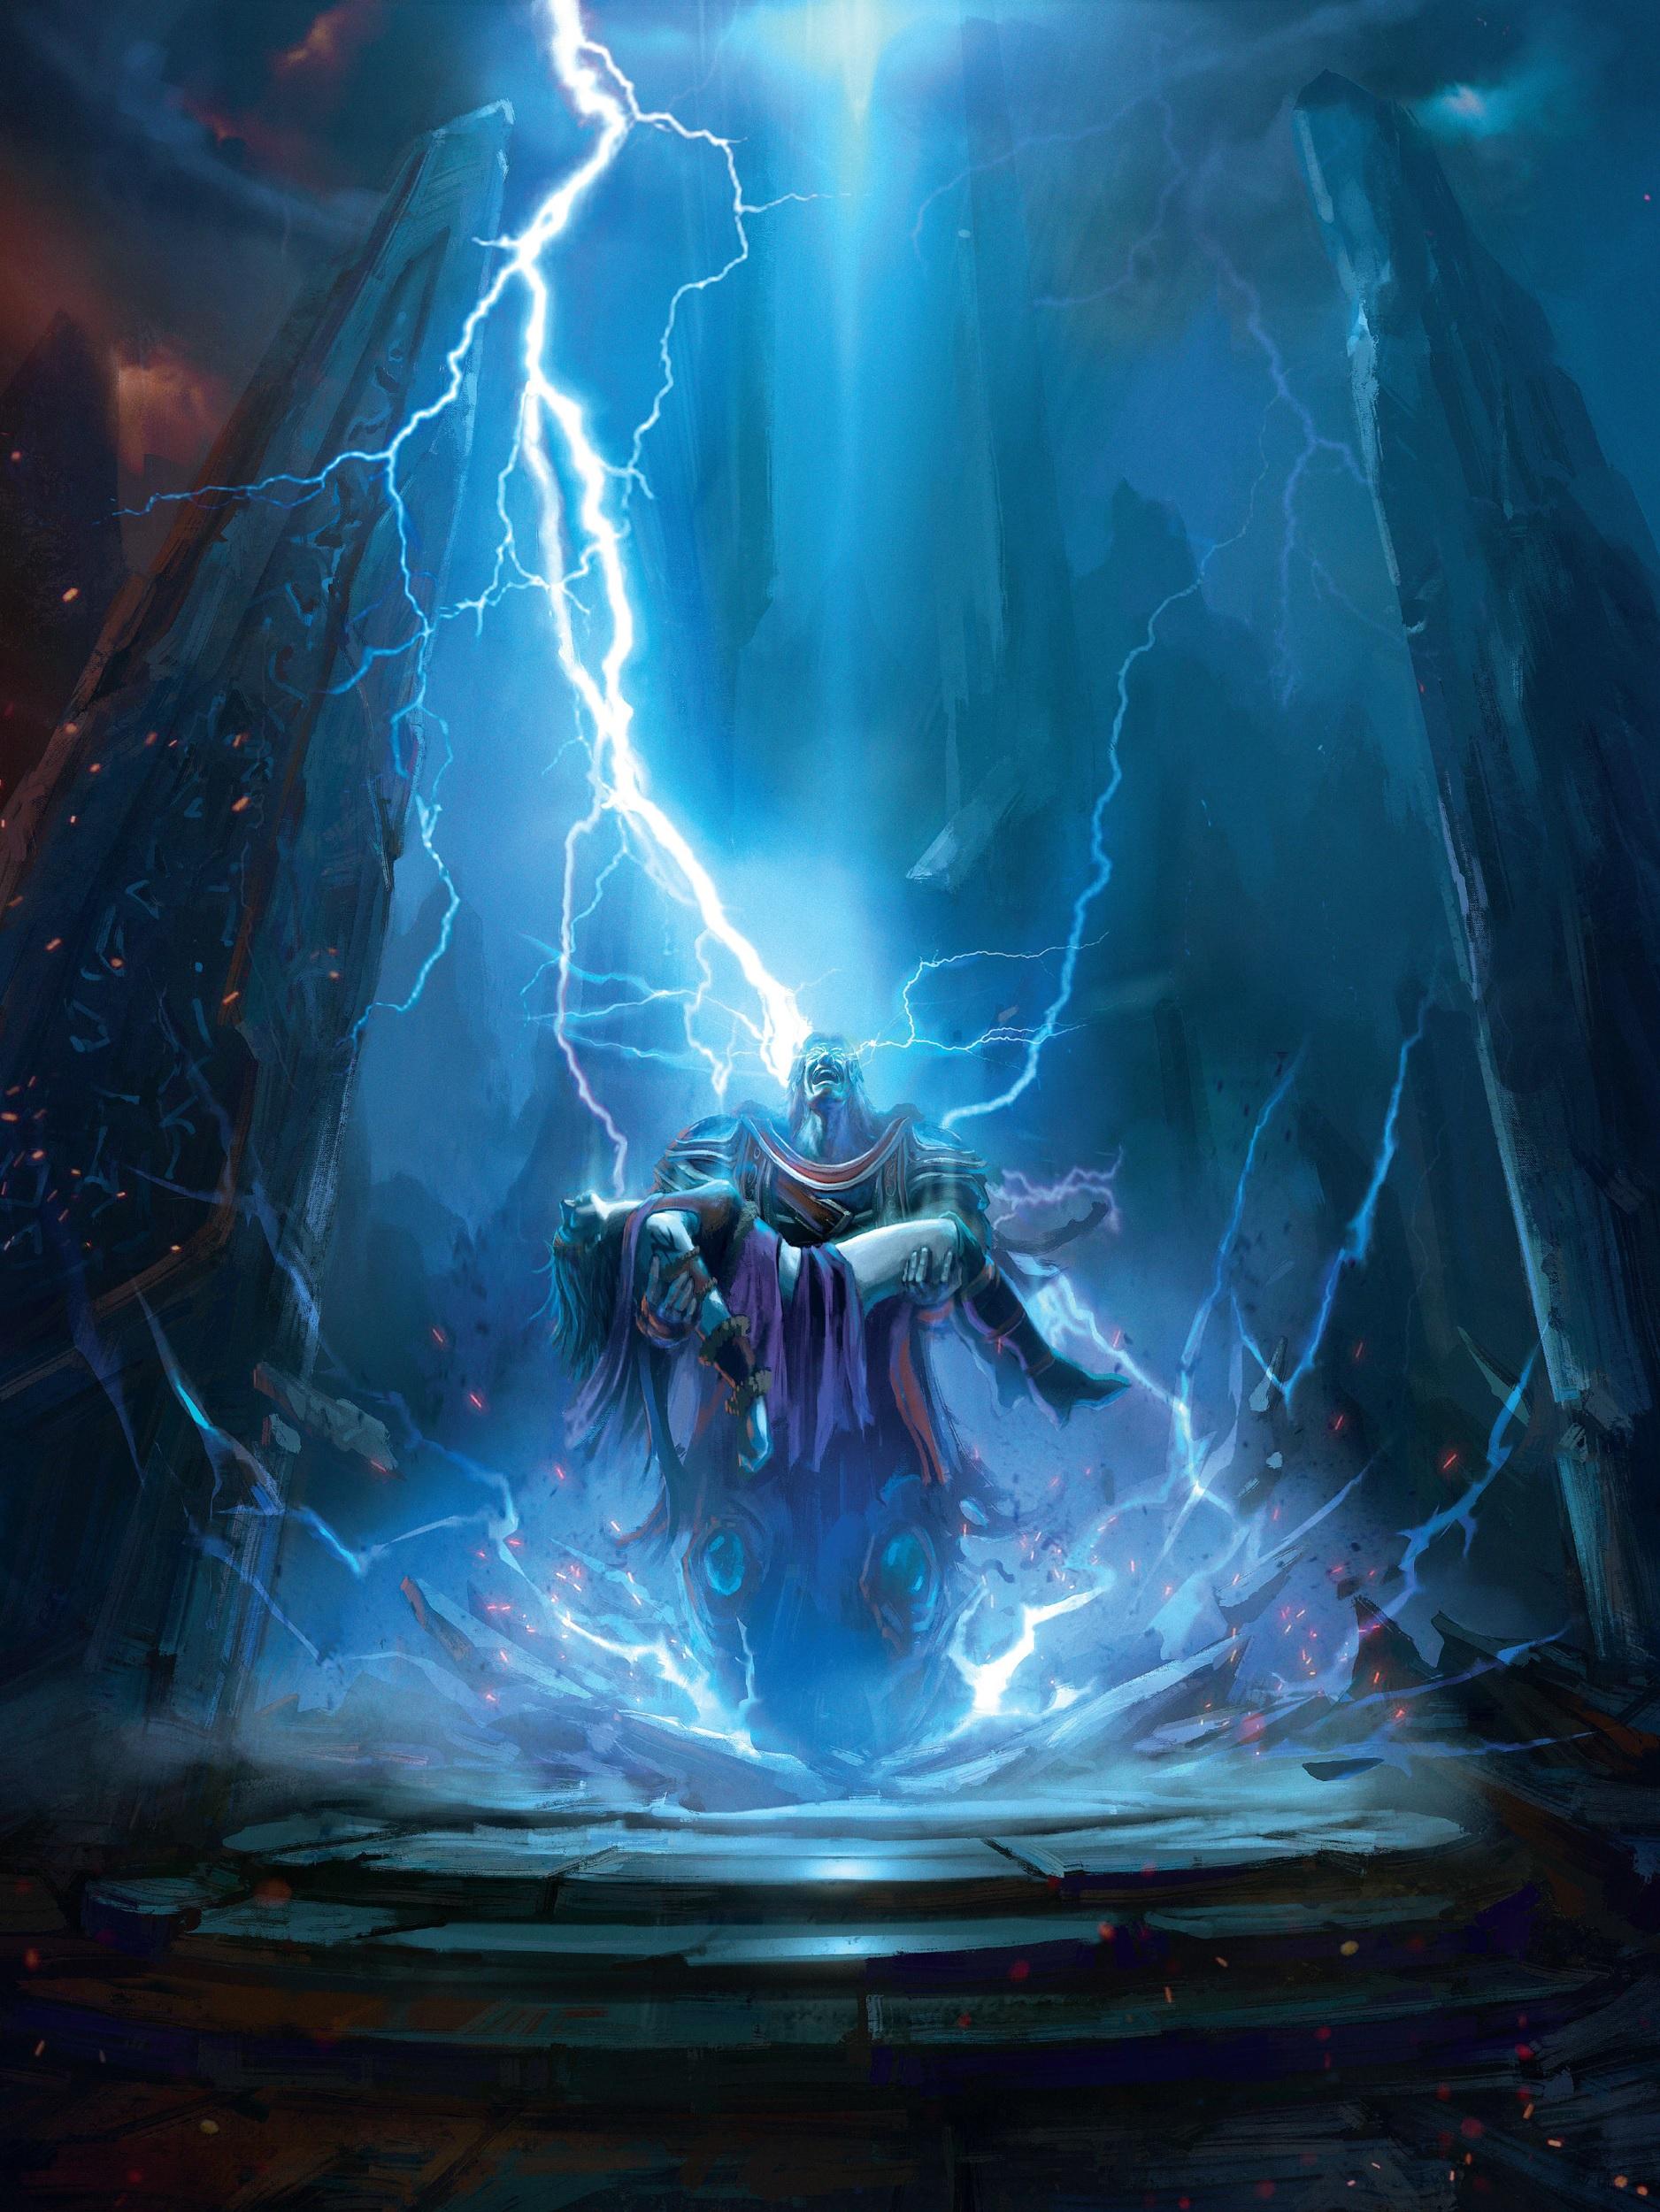 Sif'in cansız bedenini bulan eşi Bekçi Thorim